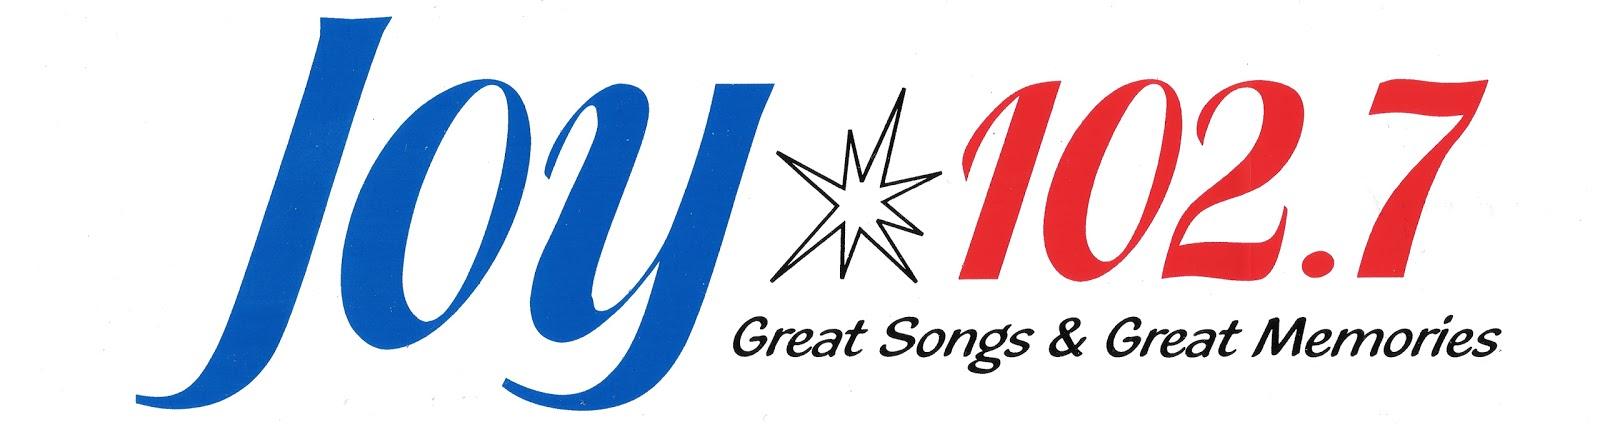 WGUS-FM